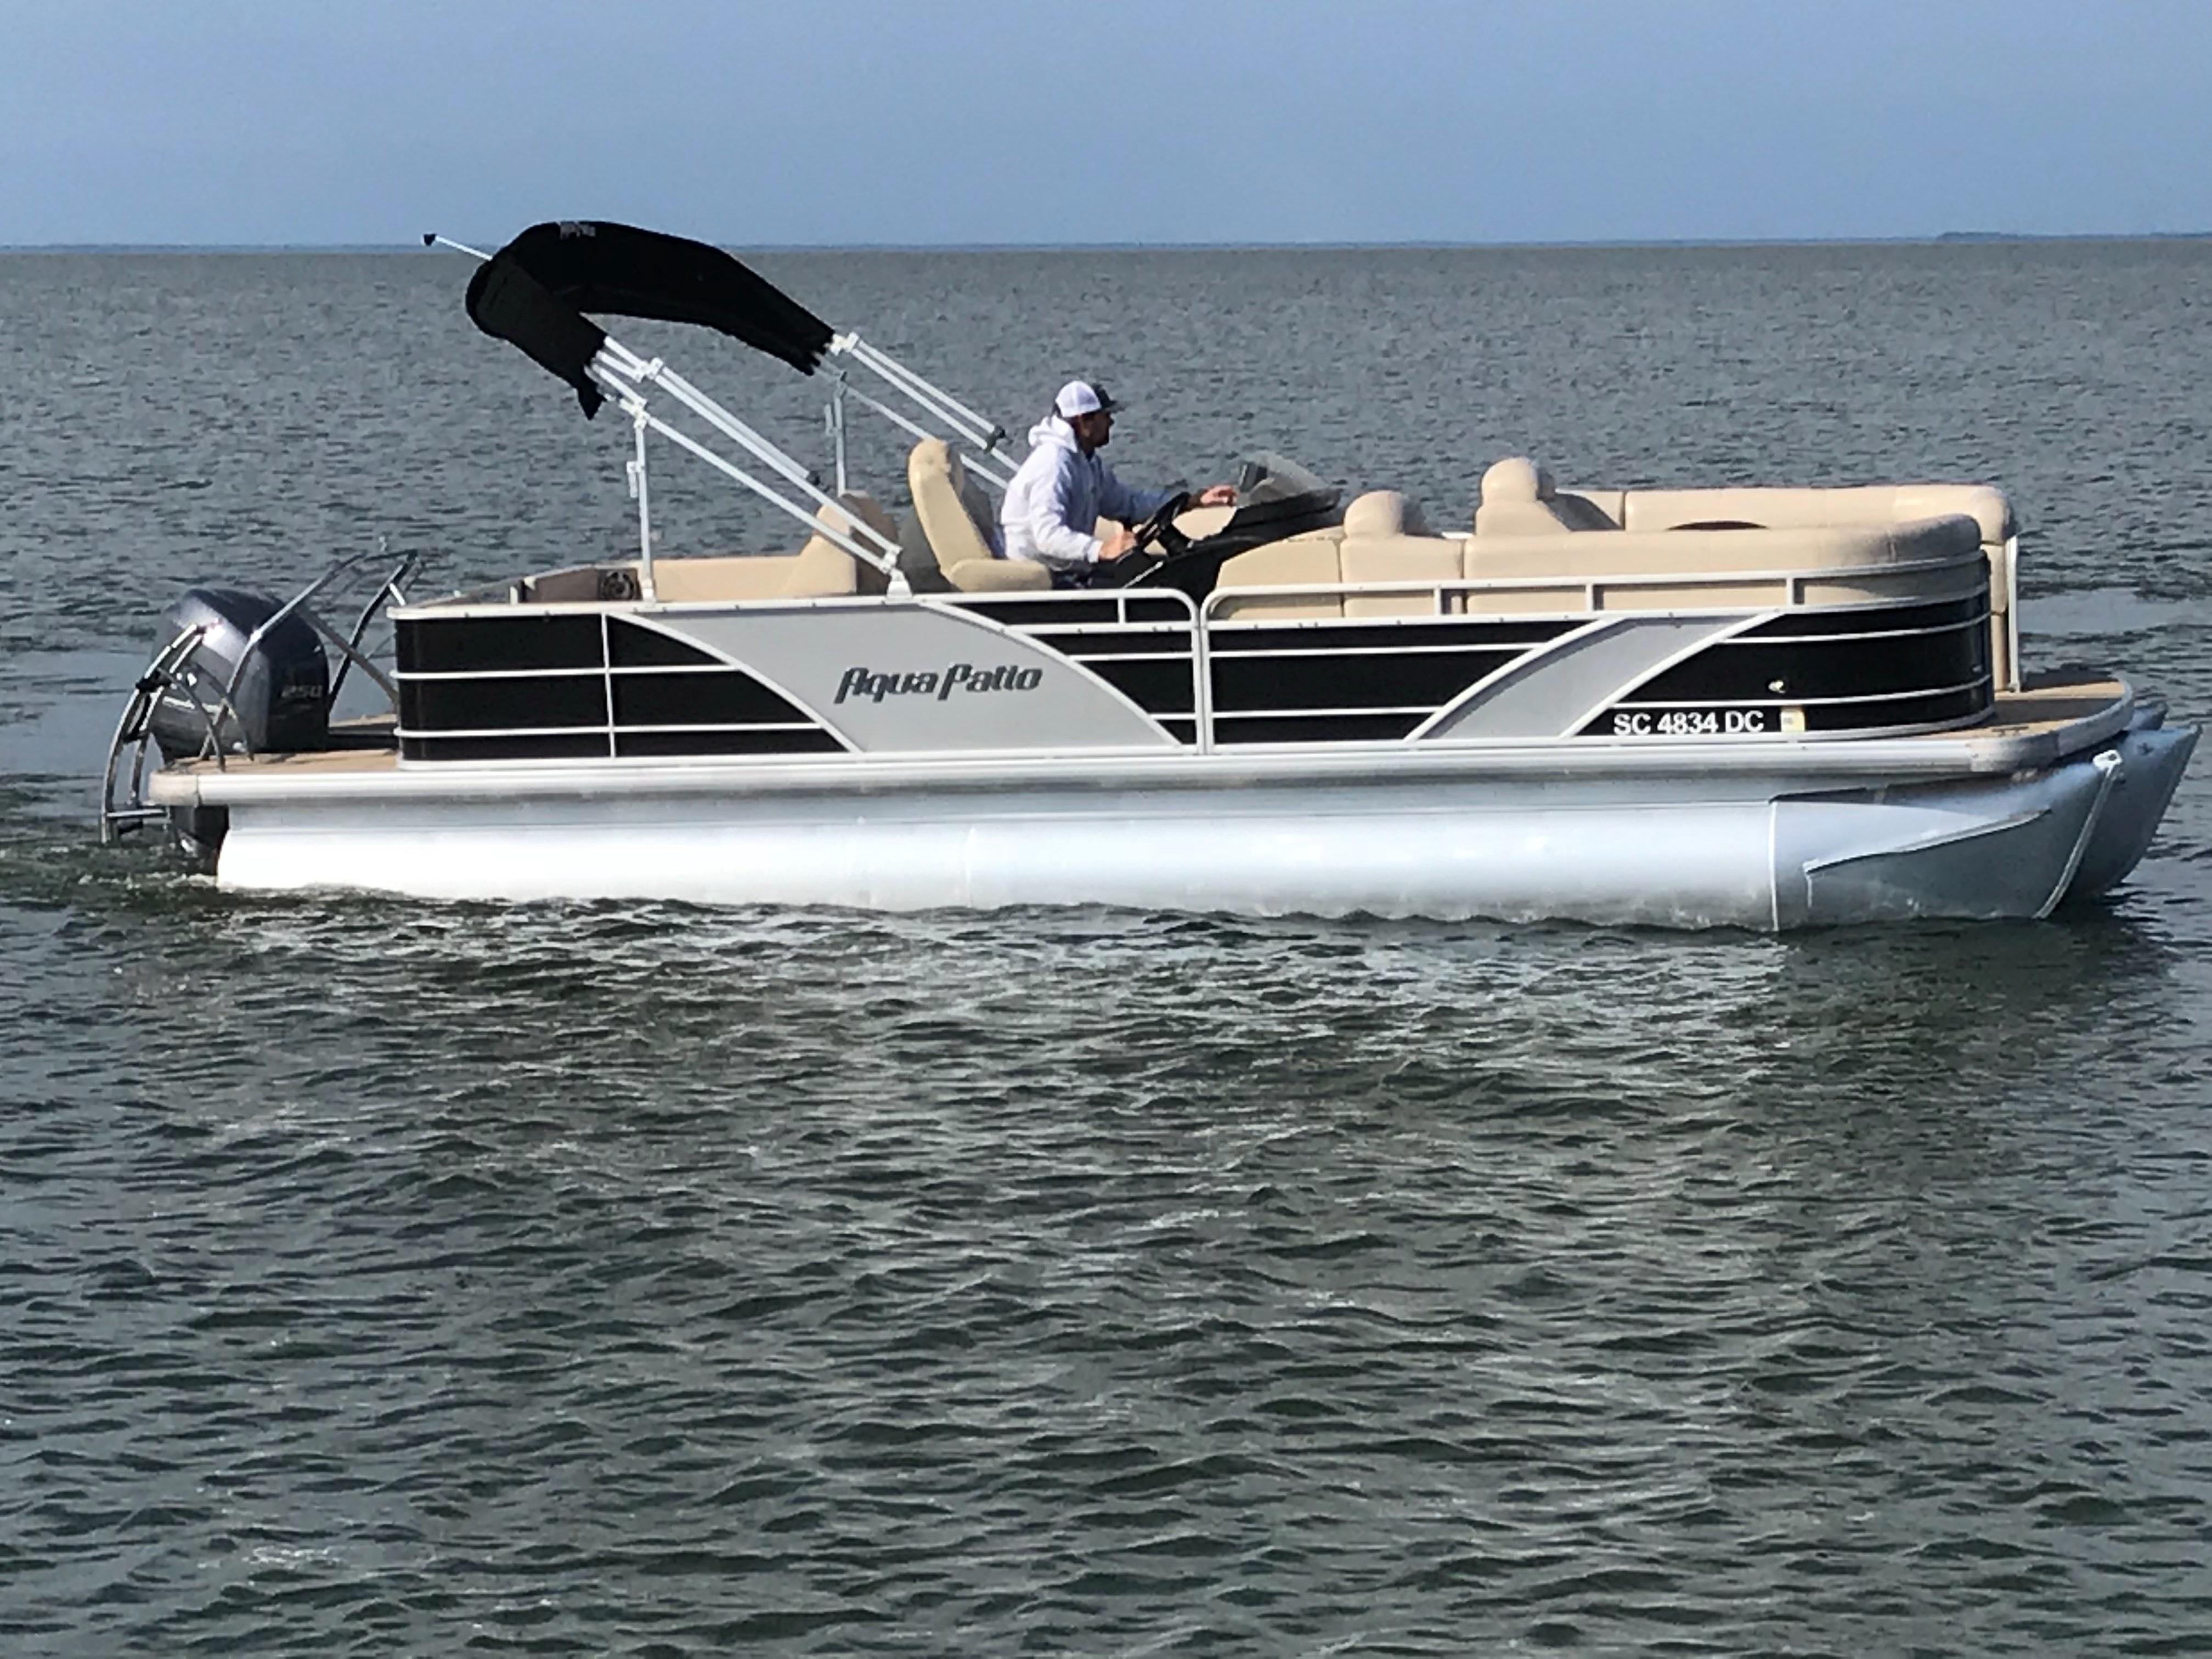 Godfrey Aqua Patio - Starboard side